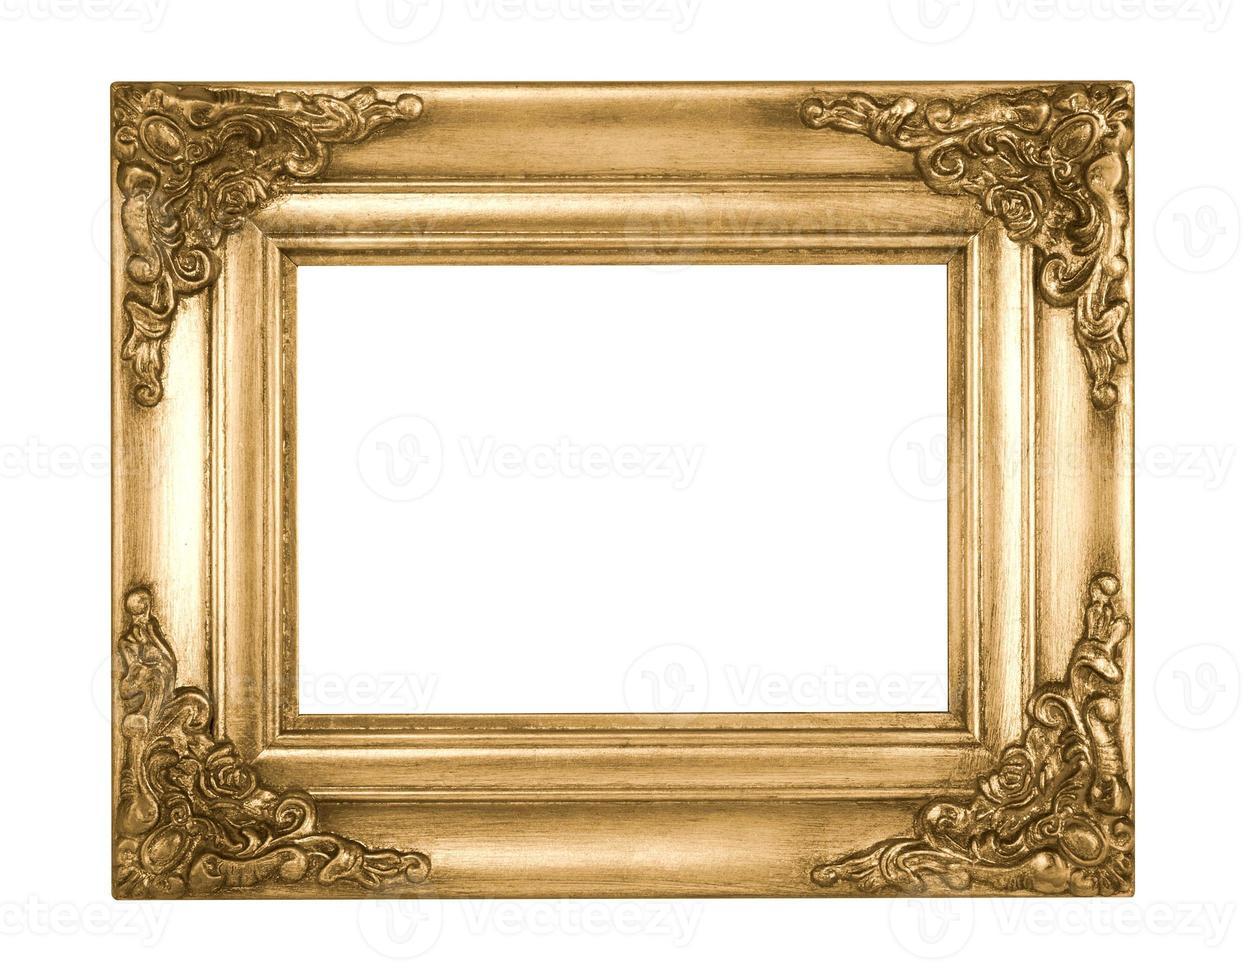 Retro Old Gold Frame photo